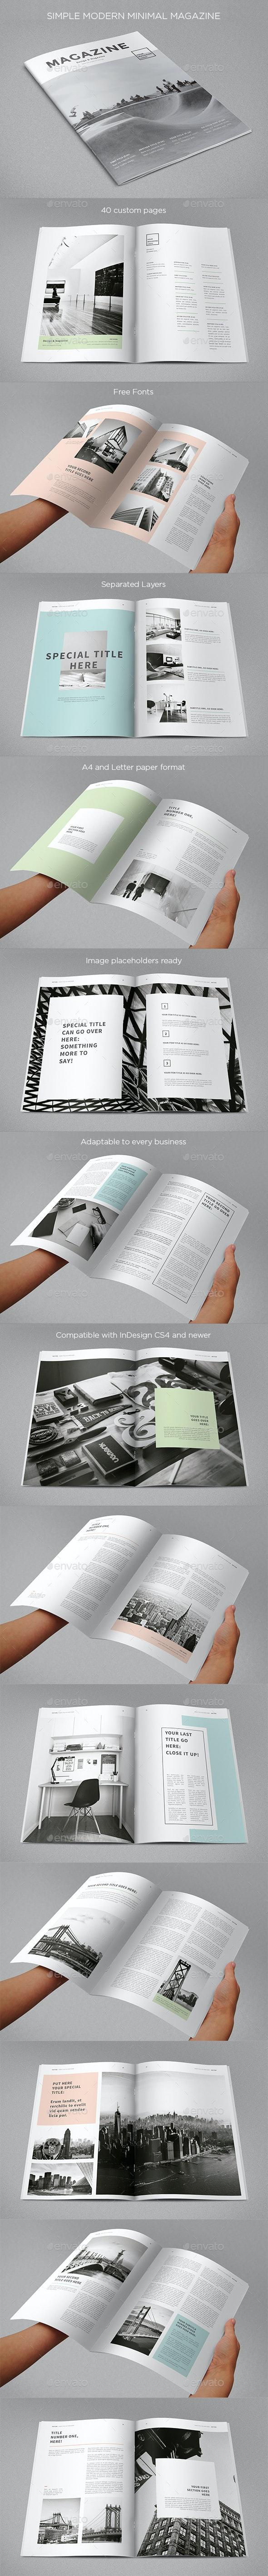 Simple Minimal Clean Magazine - Magazines Print Templates